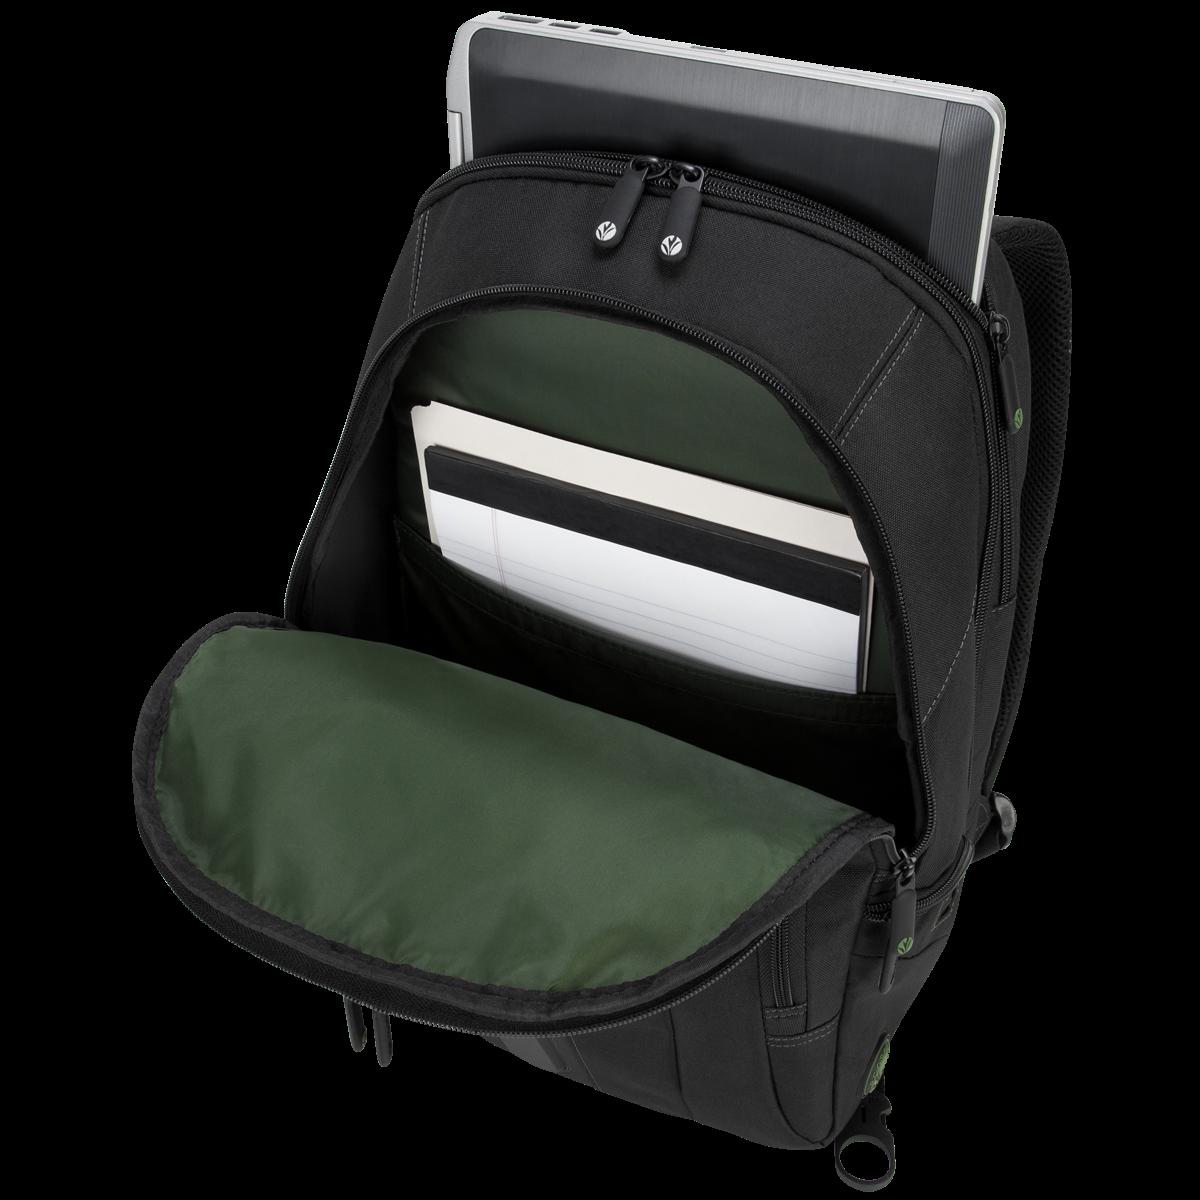 Targus 16inch Crave Laptop Backpack Tsb158ap Daftar Harga Terbaru Everki Ekp119 Flight Checkpoint Friendly Fits Up To 16 Inch Hitam 156 Spruce Ecosmart Tbb013us Black Backpacks